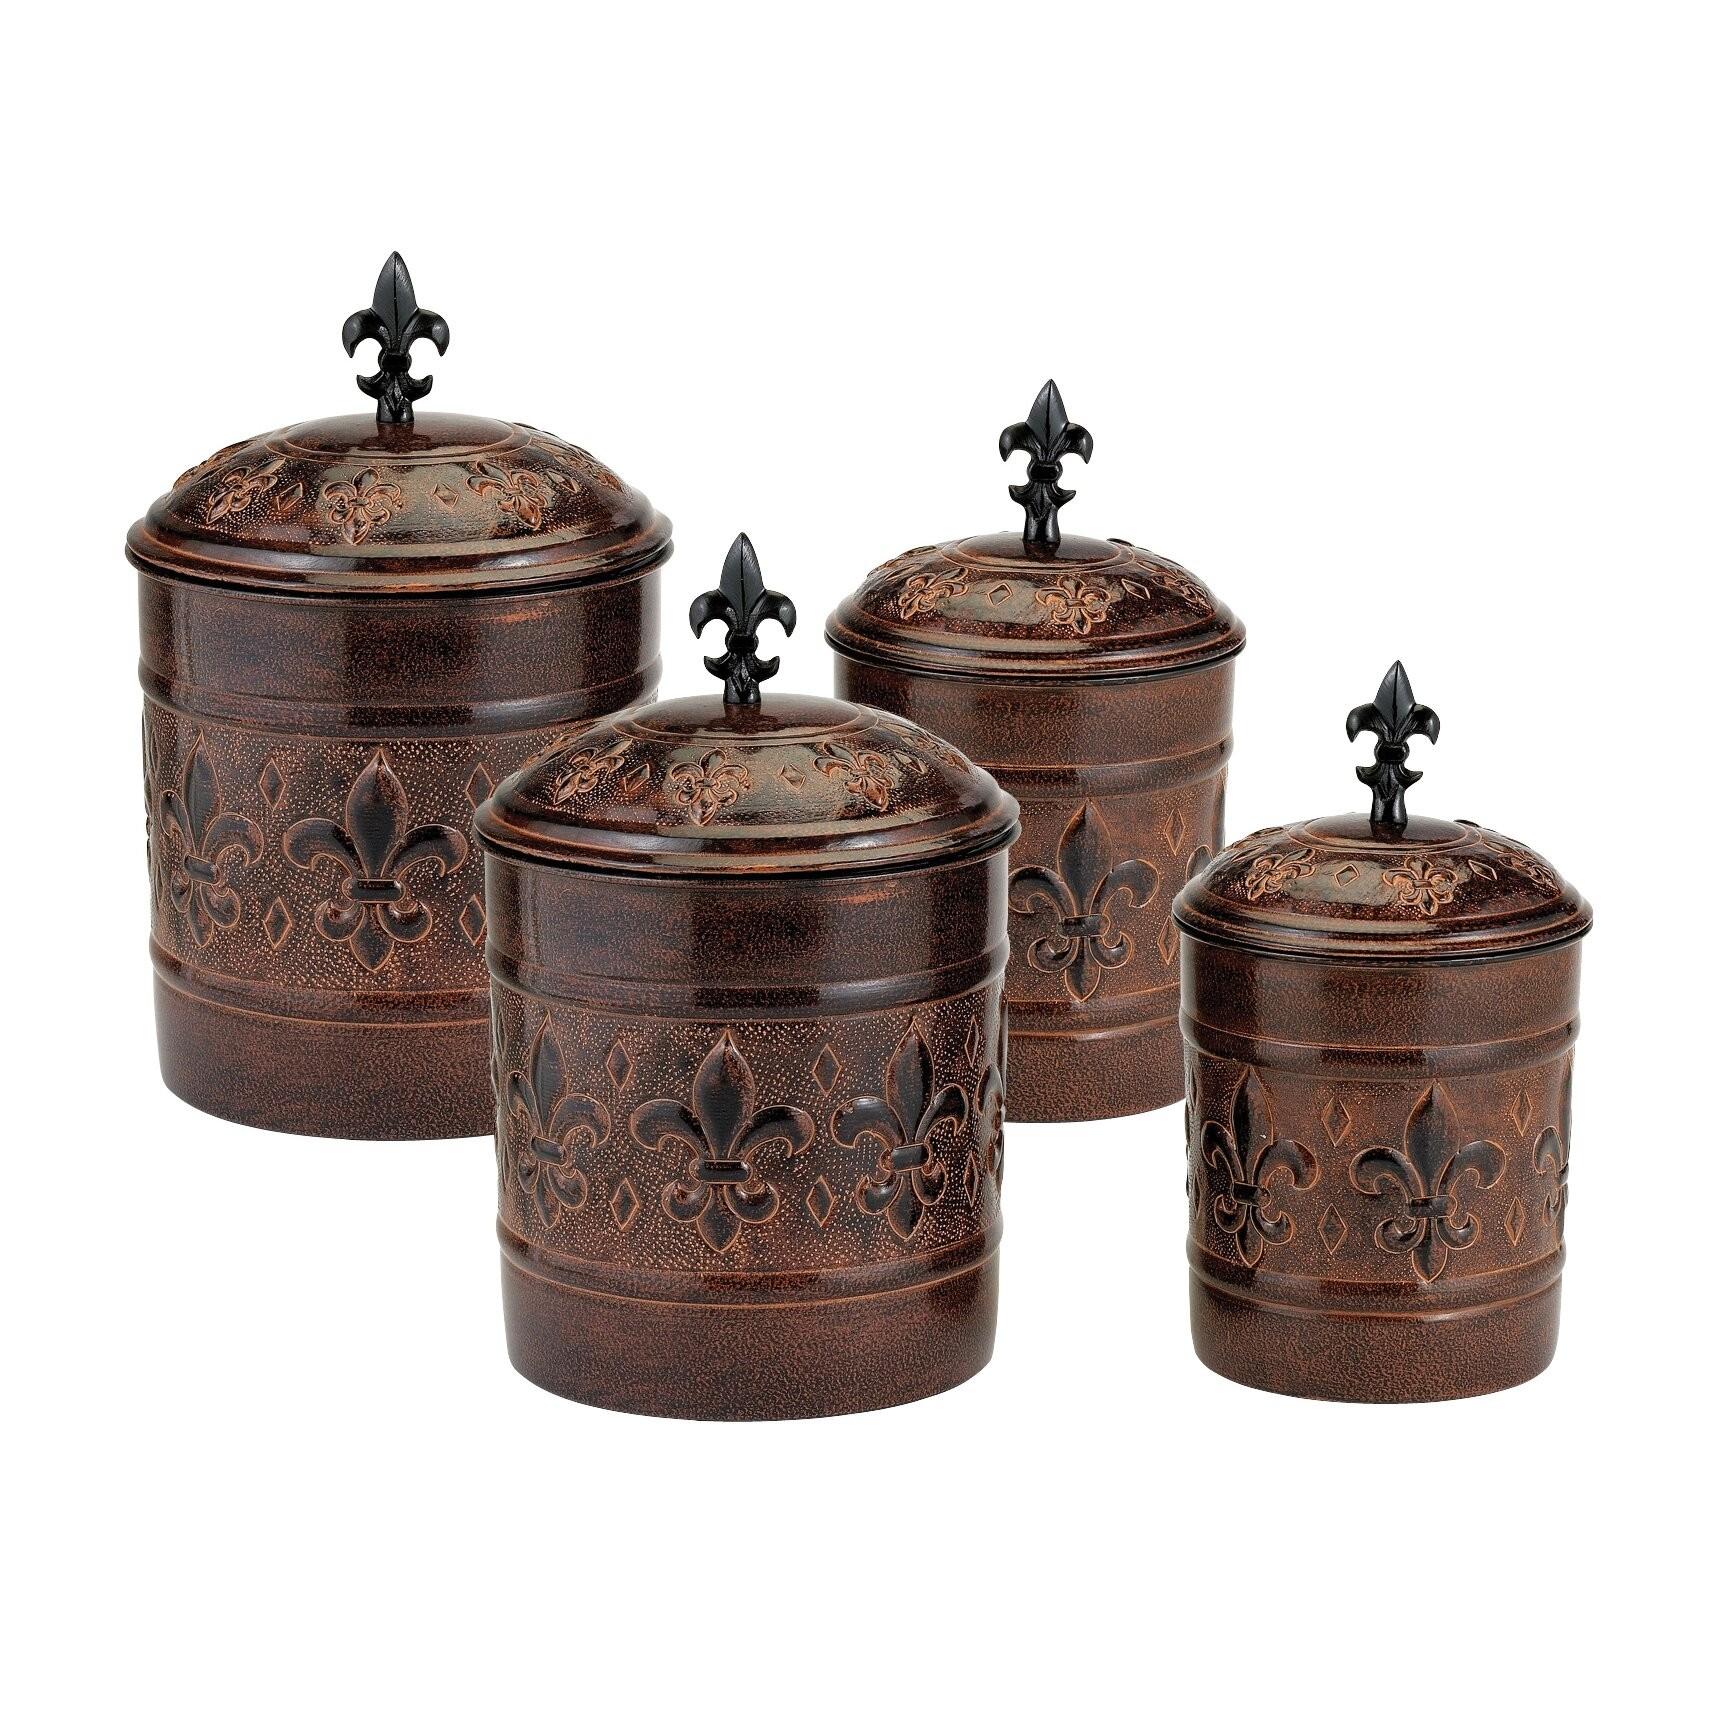 unique kitchen canisters sets ideas on foter rh foter com